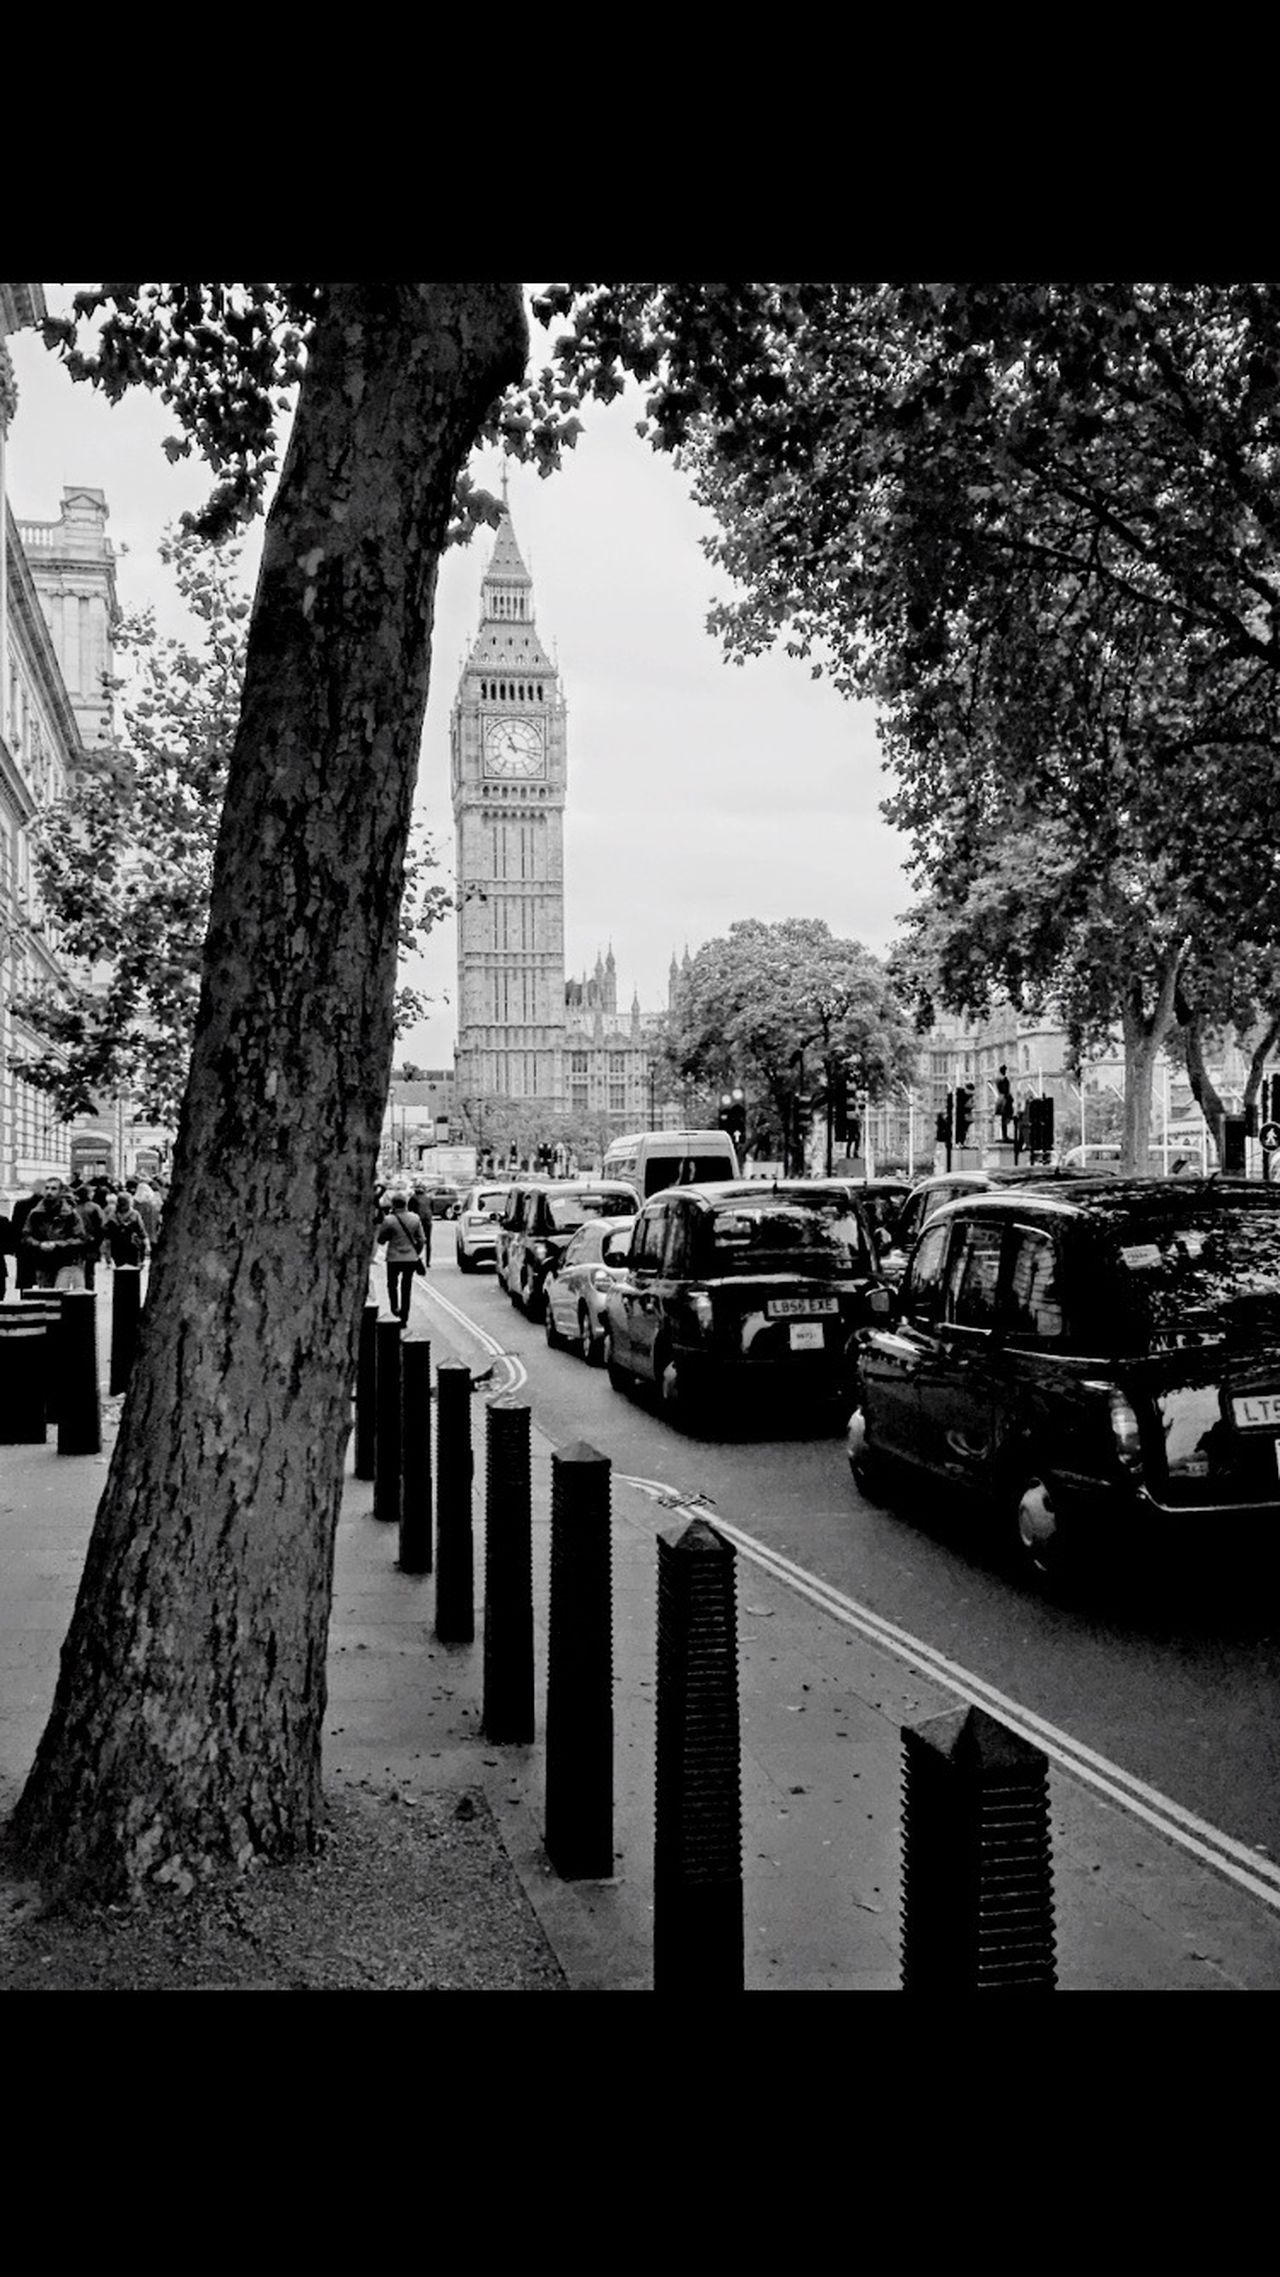 B&w Street Photography London Big Ben Black Cabs